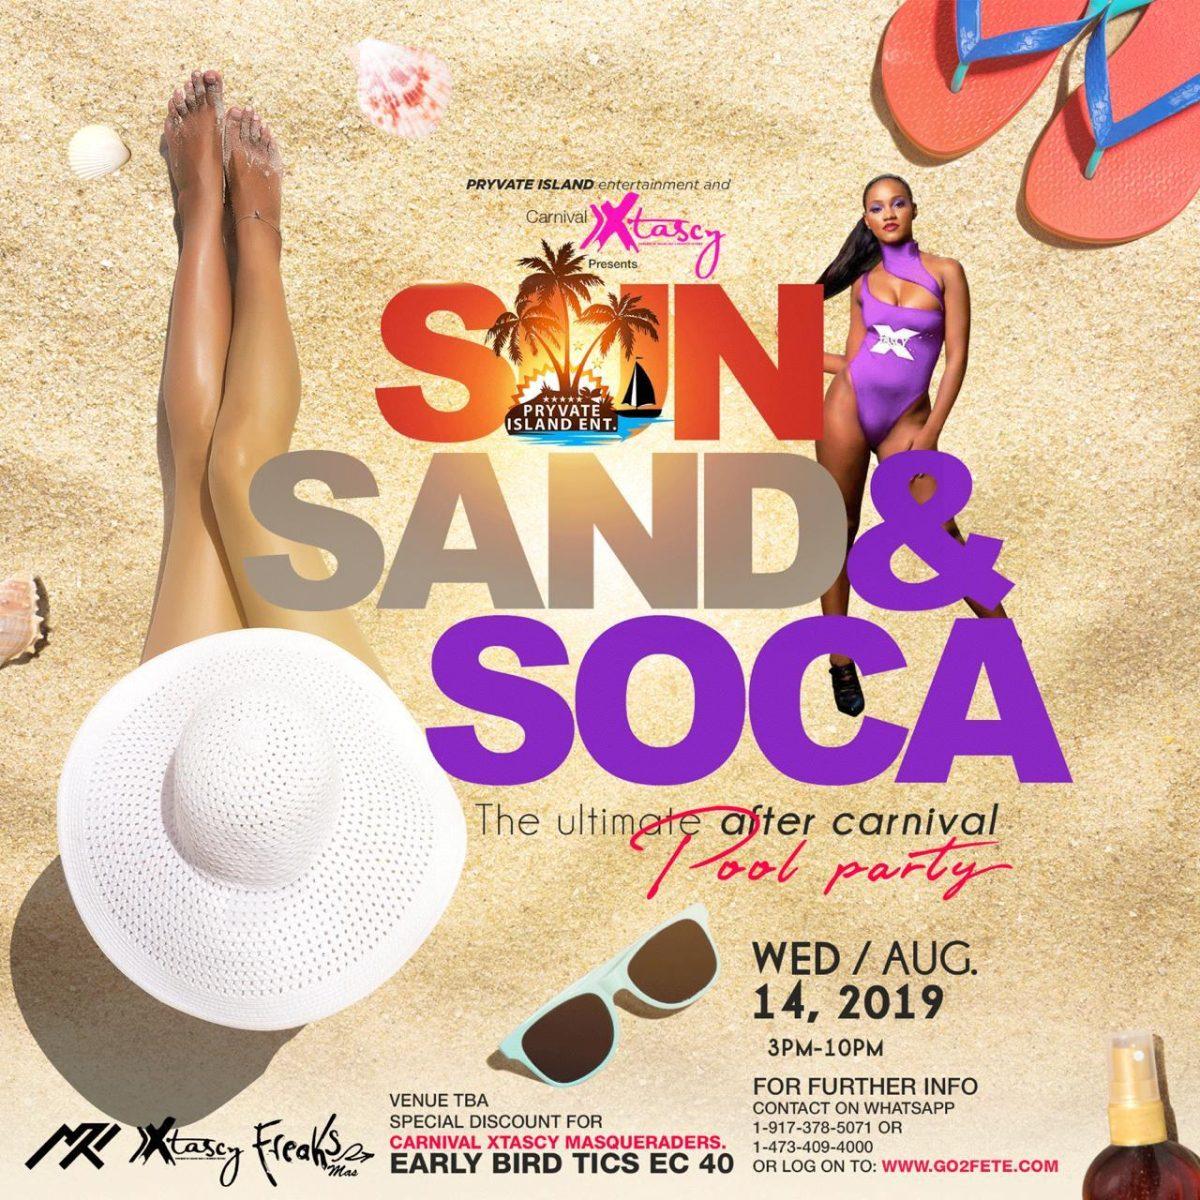 Sun Sand and Soca